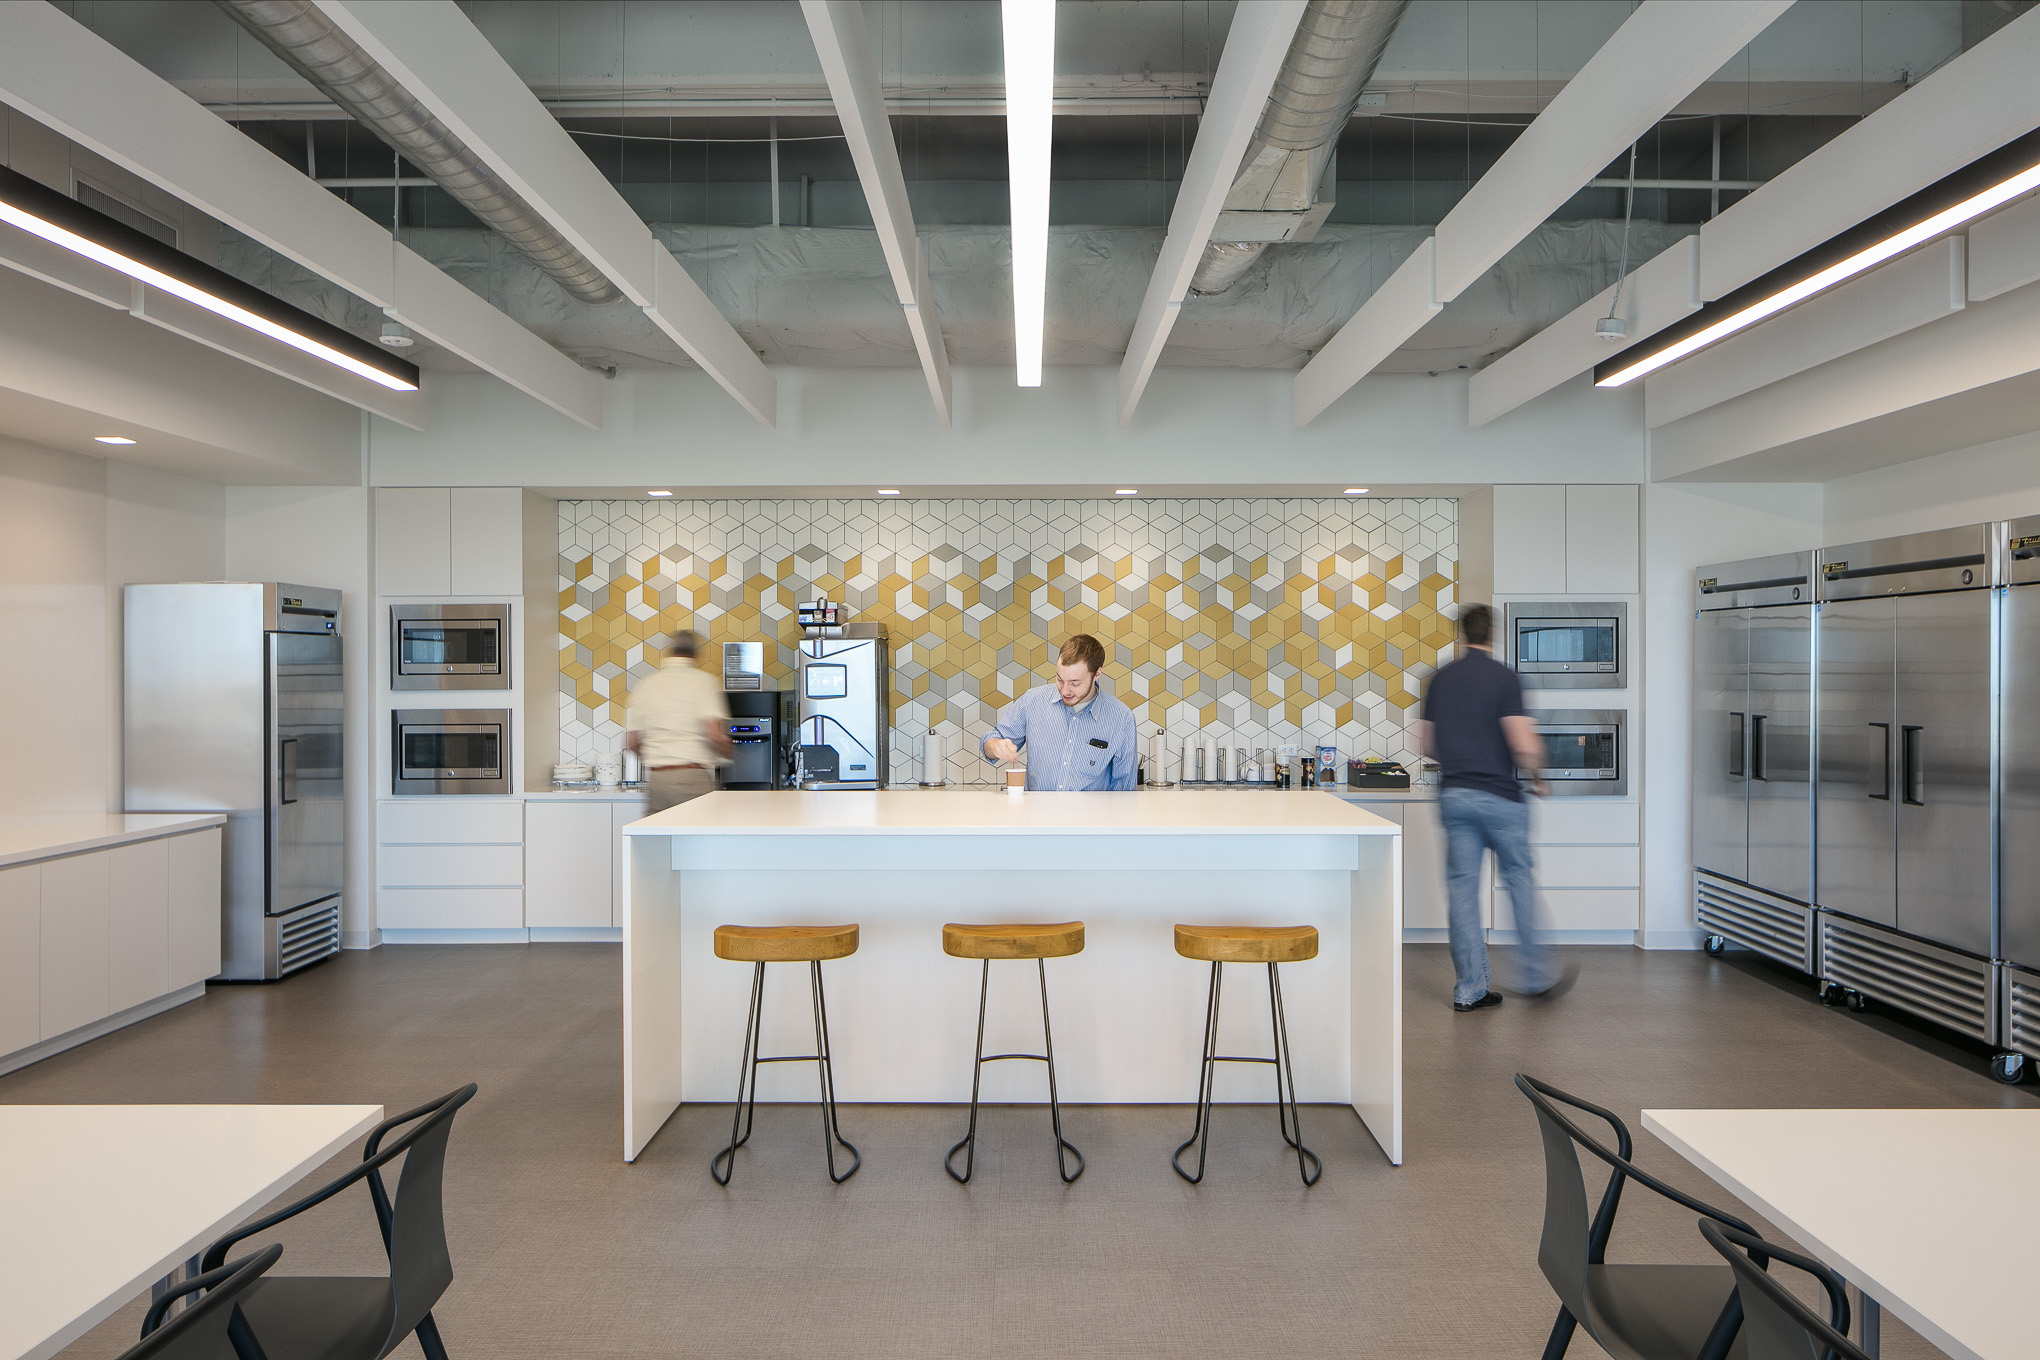 Crestron Headquarters, Plano TX, Gensler Design